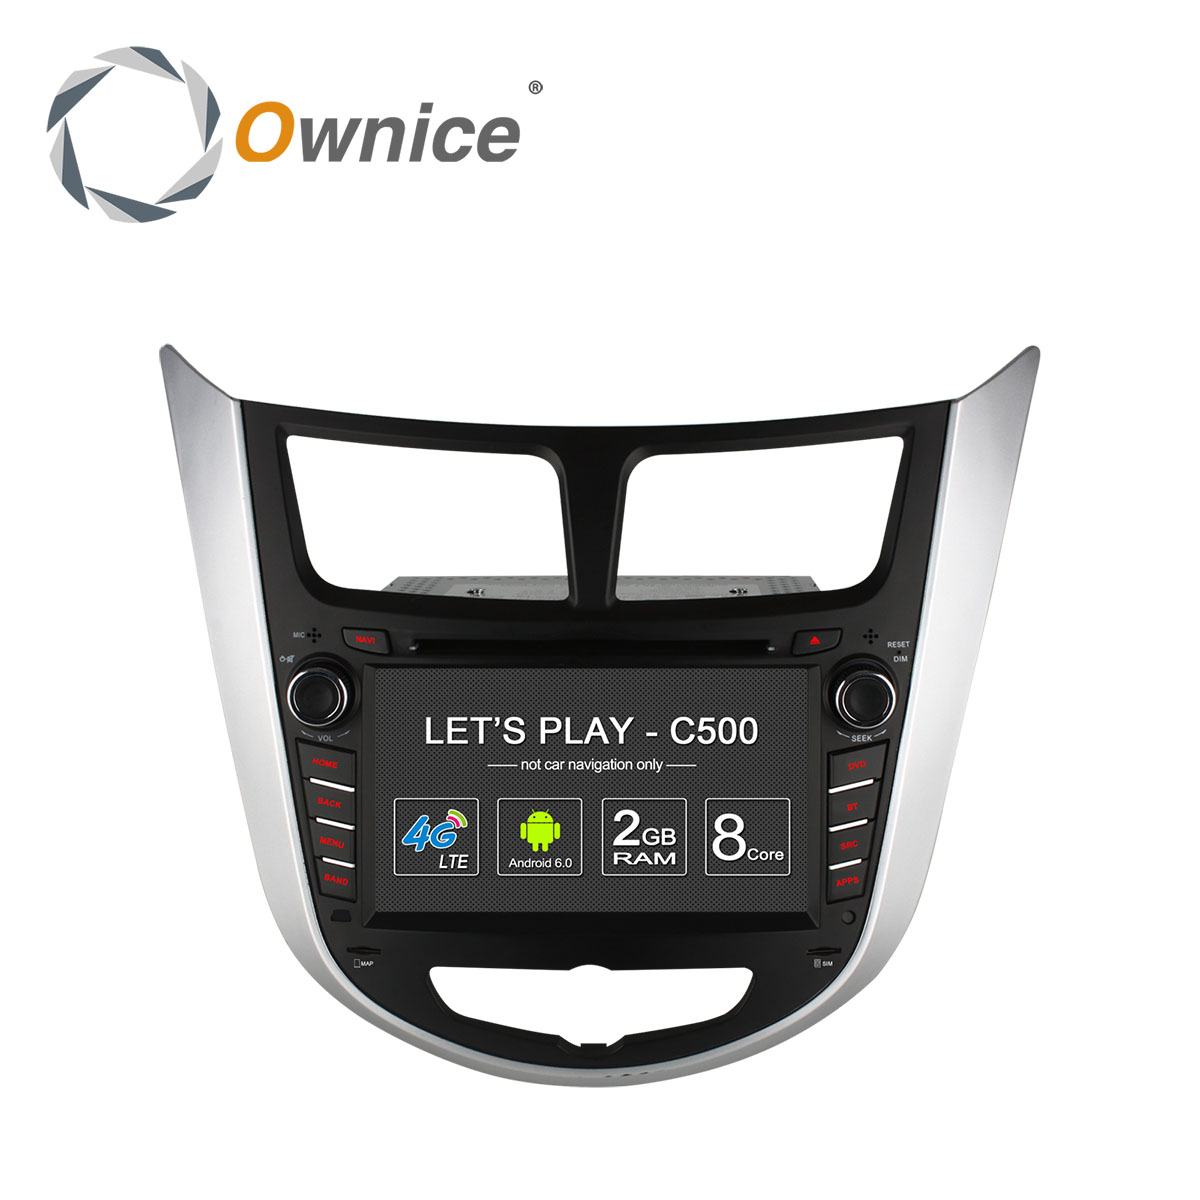 "Hyundai Verna, Accent, Solaris, i25 2011-2015 :: Màn 7"" :: Ownice C500 :: 32GB :: OL-7797G"